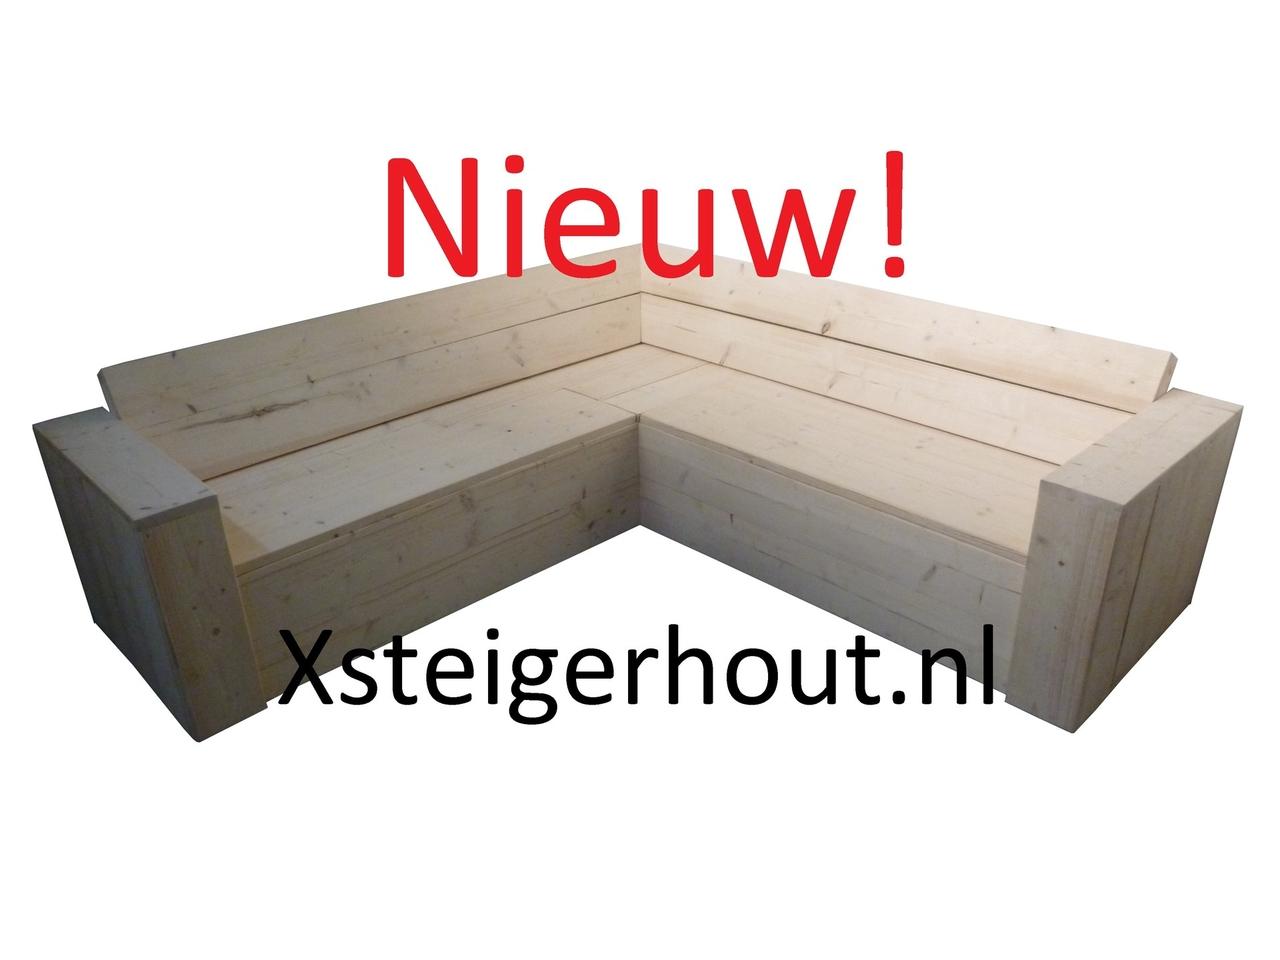 Steigerhout Hoekbank Met Opbergruimte.Steigerhout Hoekbank Met Opbergruimte Bouwpakket